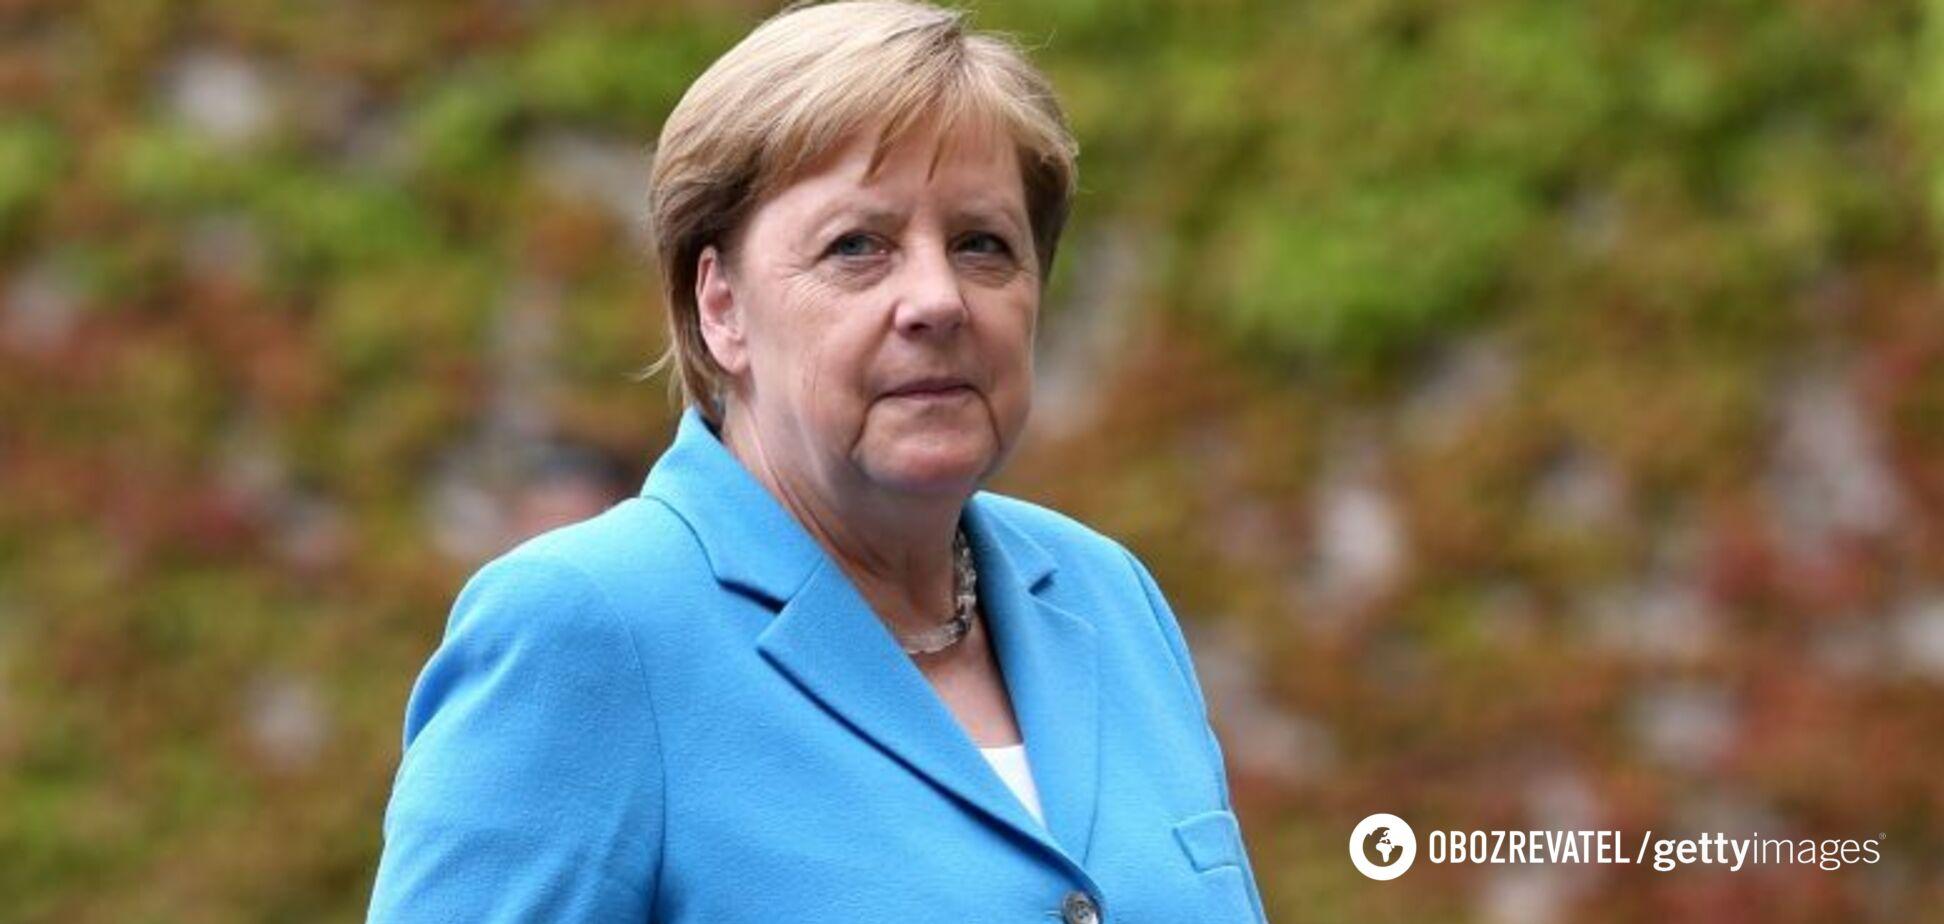 Меркель в третий раз за месяц стало плохо на публике. Видео